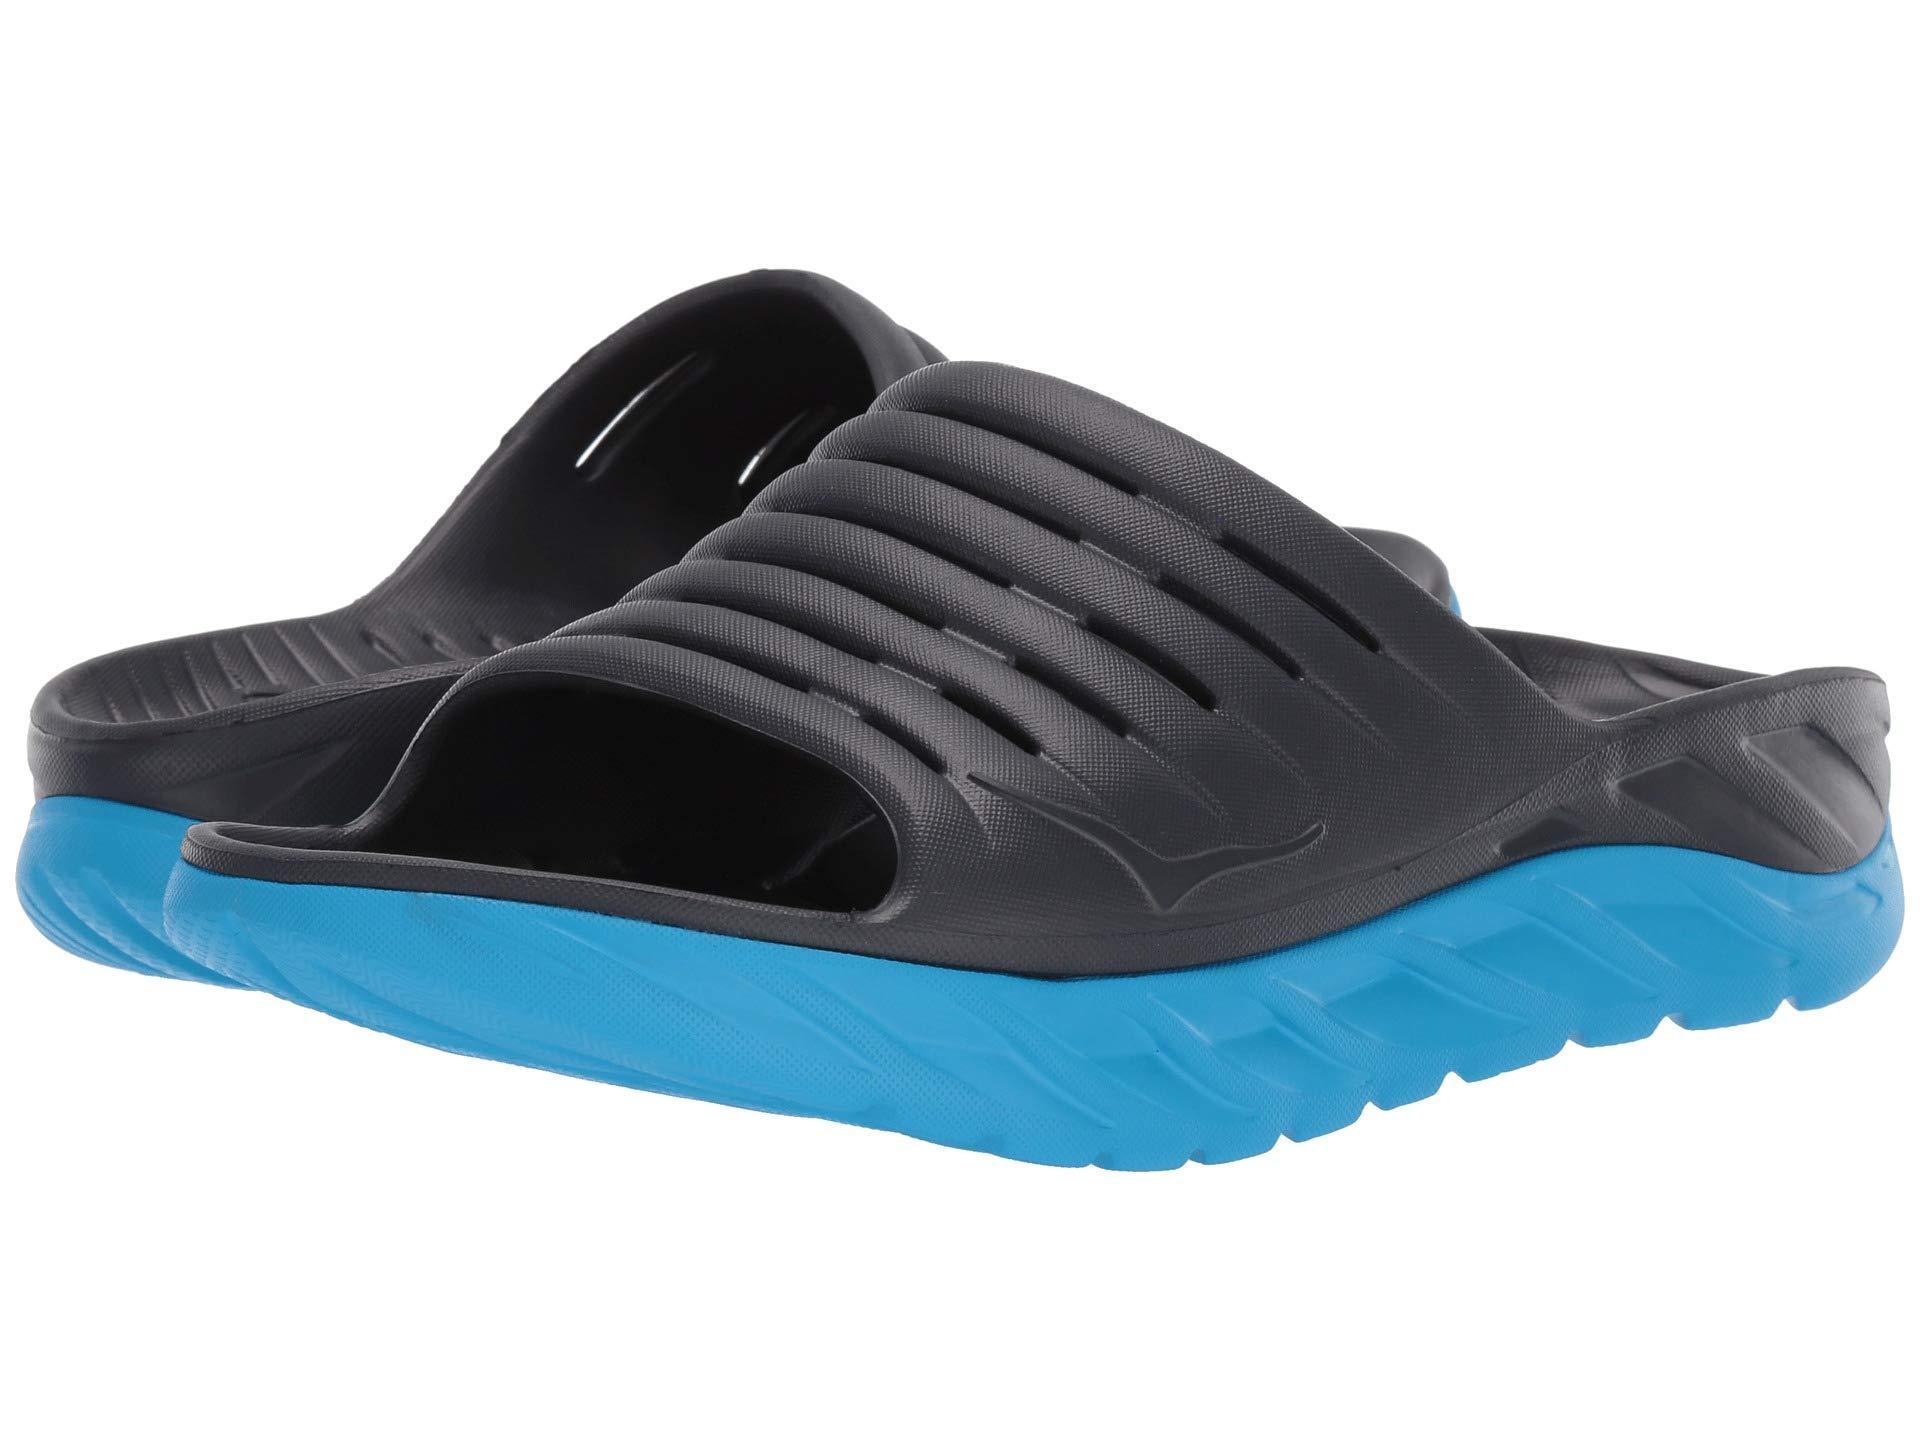 1a8847a2cc24 Lyst - Hoka One One Ora Recovery Slide 2 (black black) Men s Shoes ...